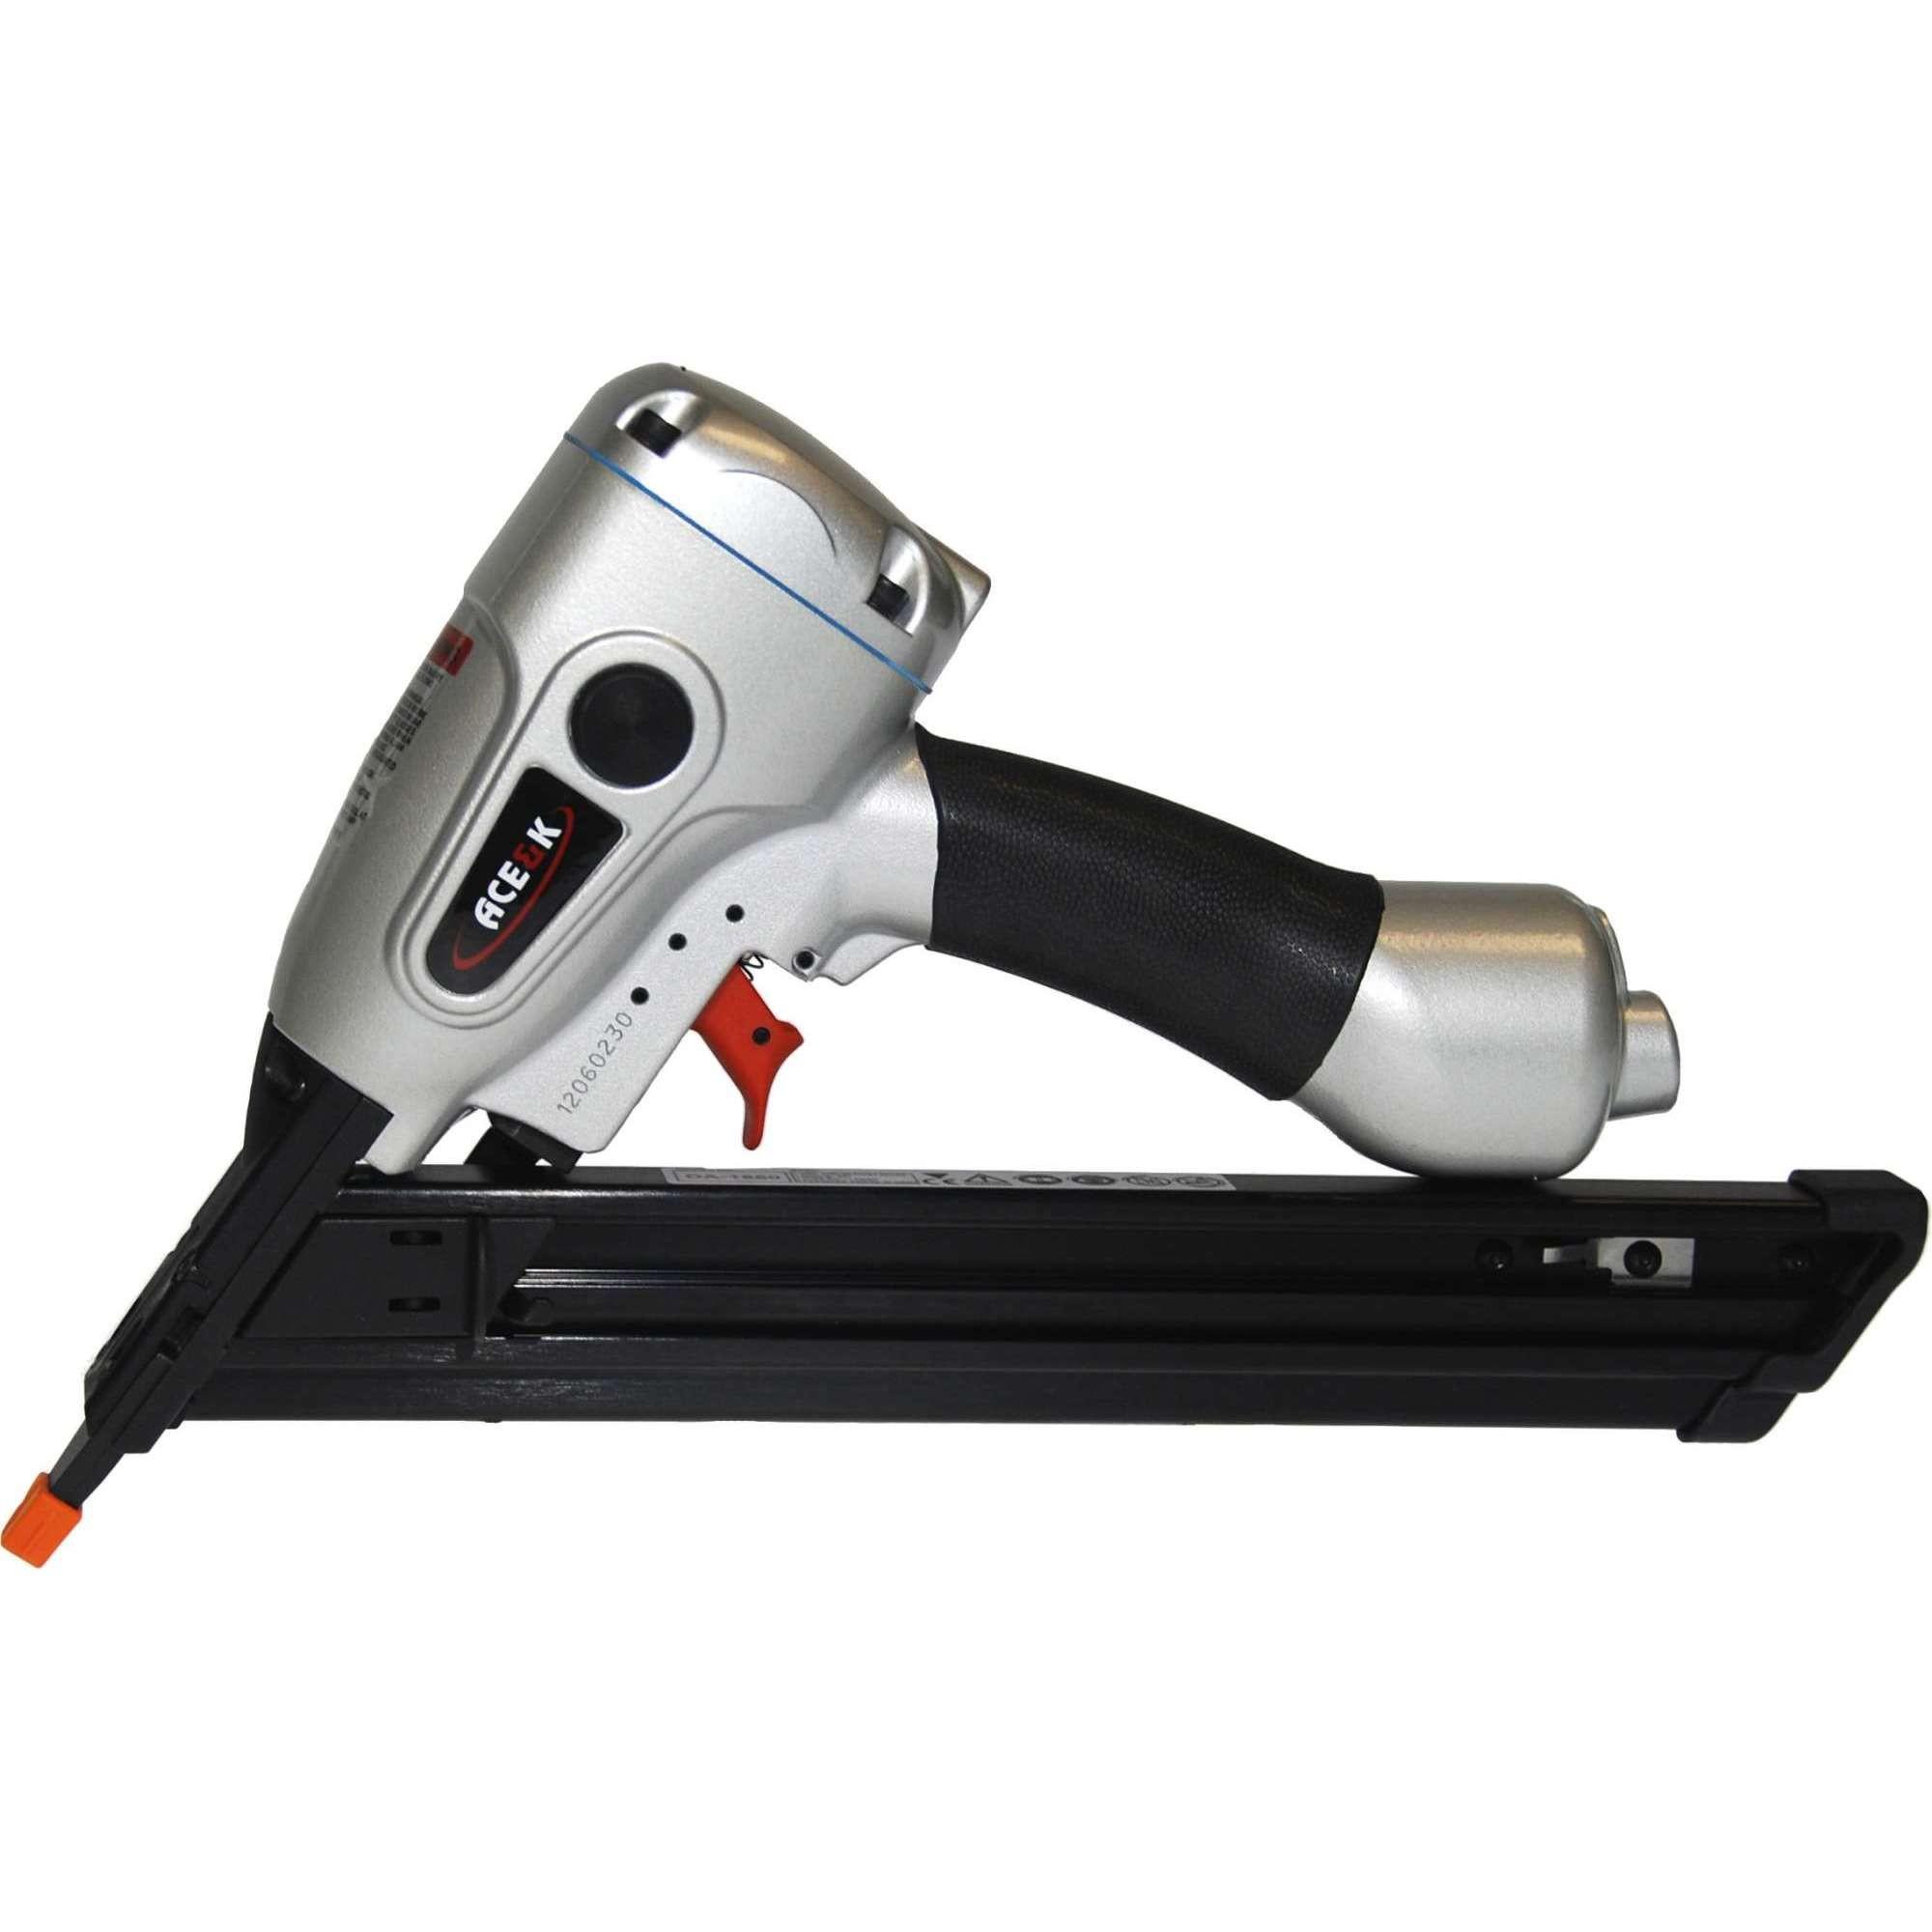 Ace & K 15 Gauge Da Angled Nailer 34 Degree 25-50mm